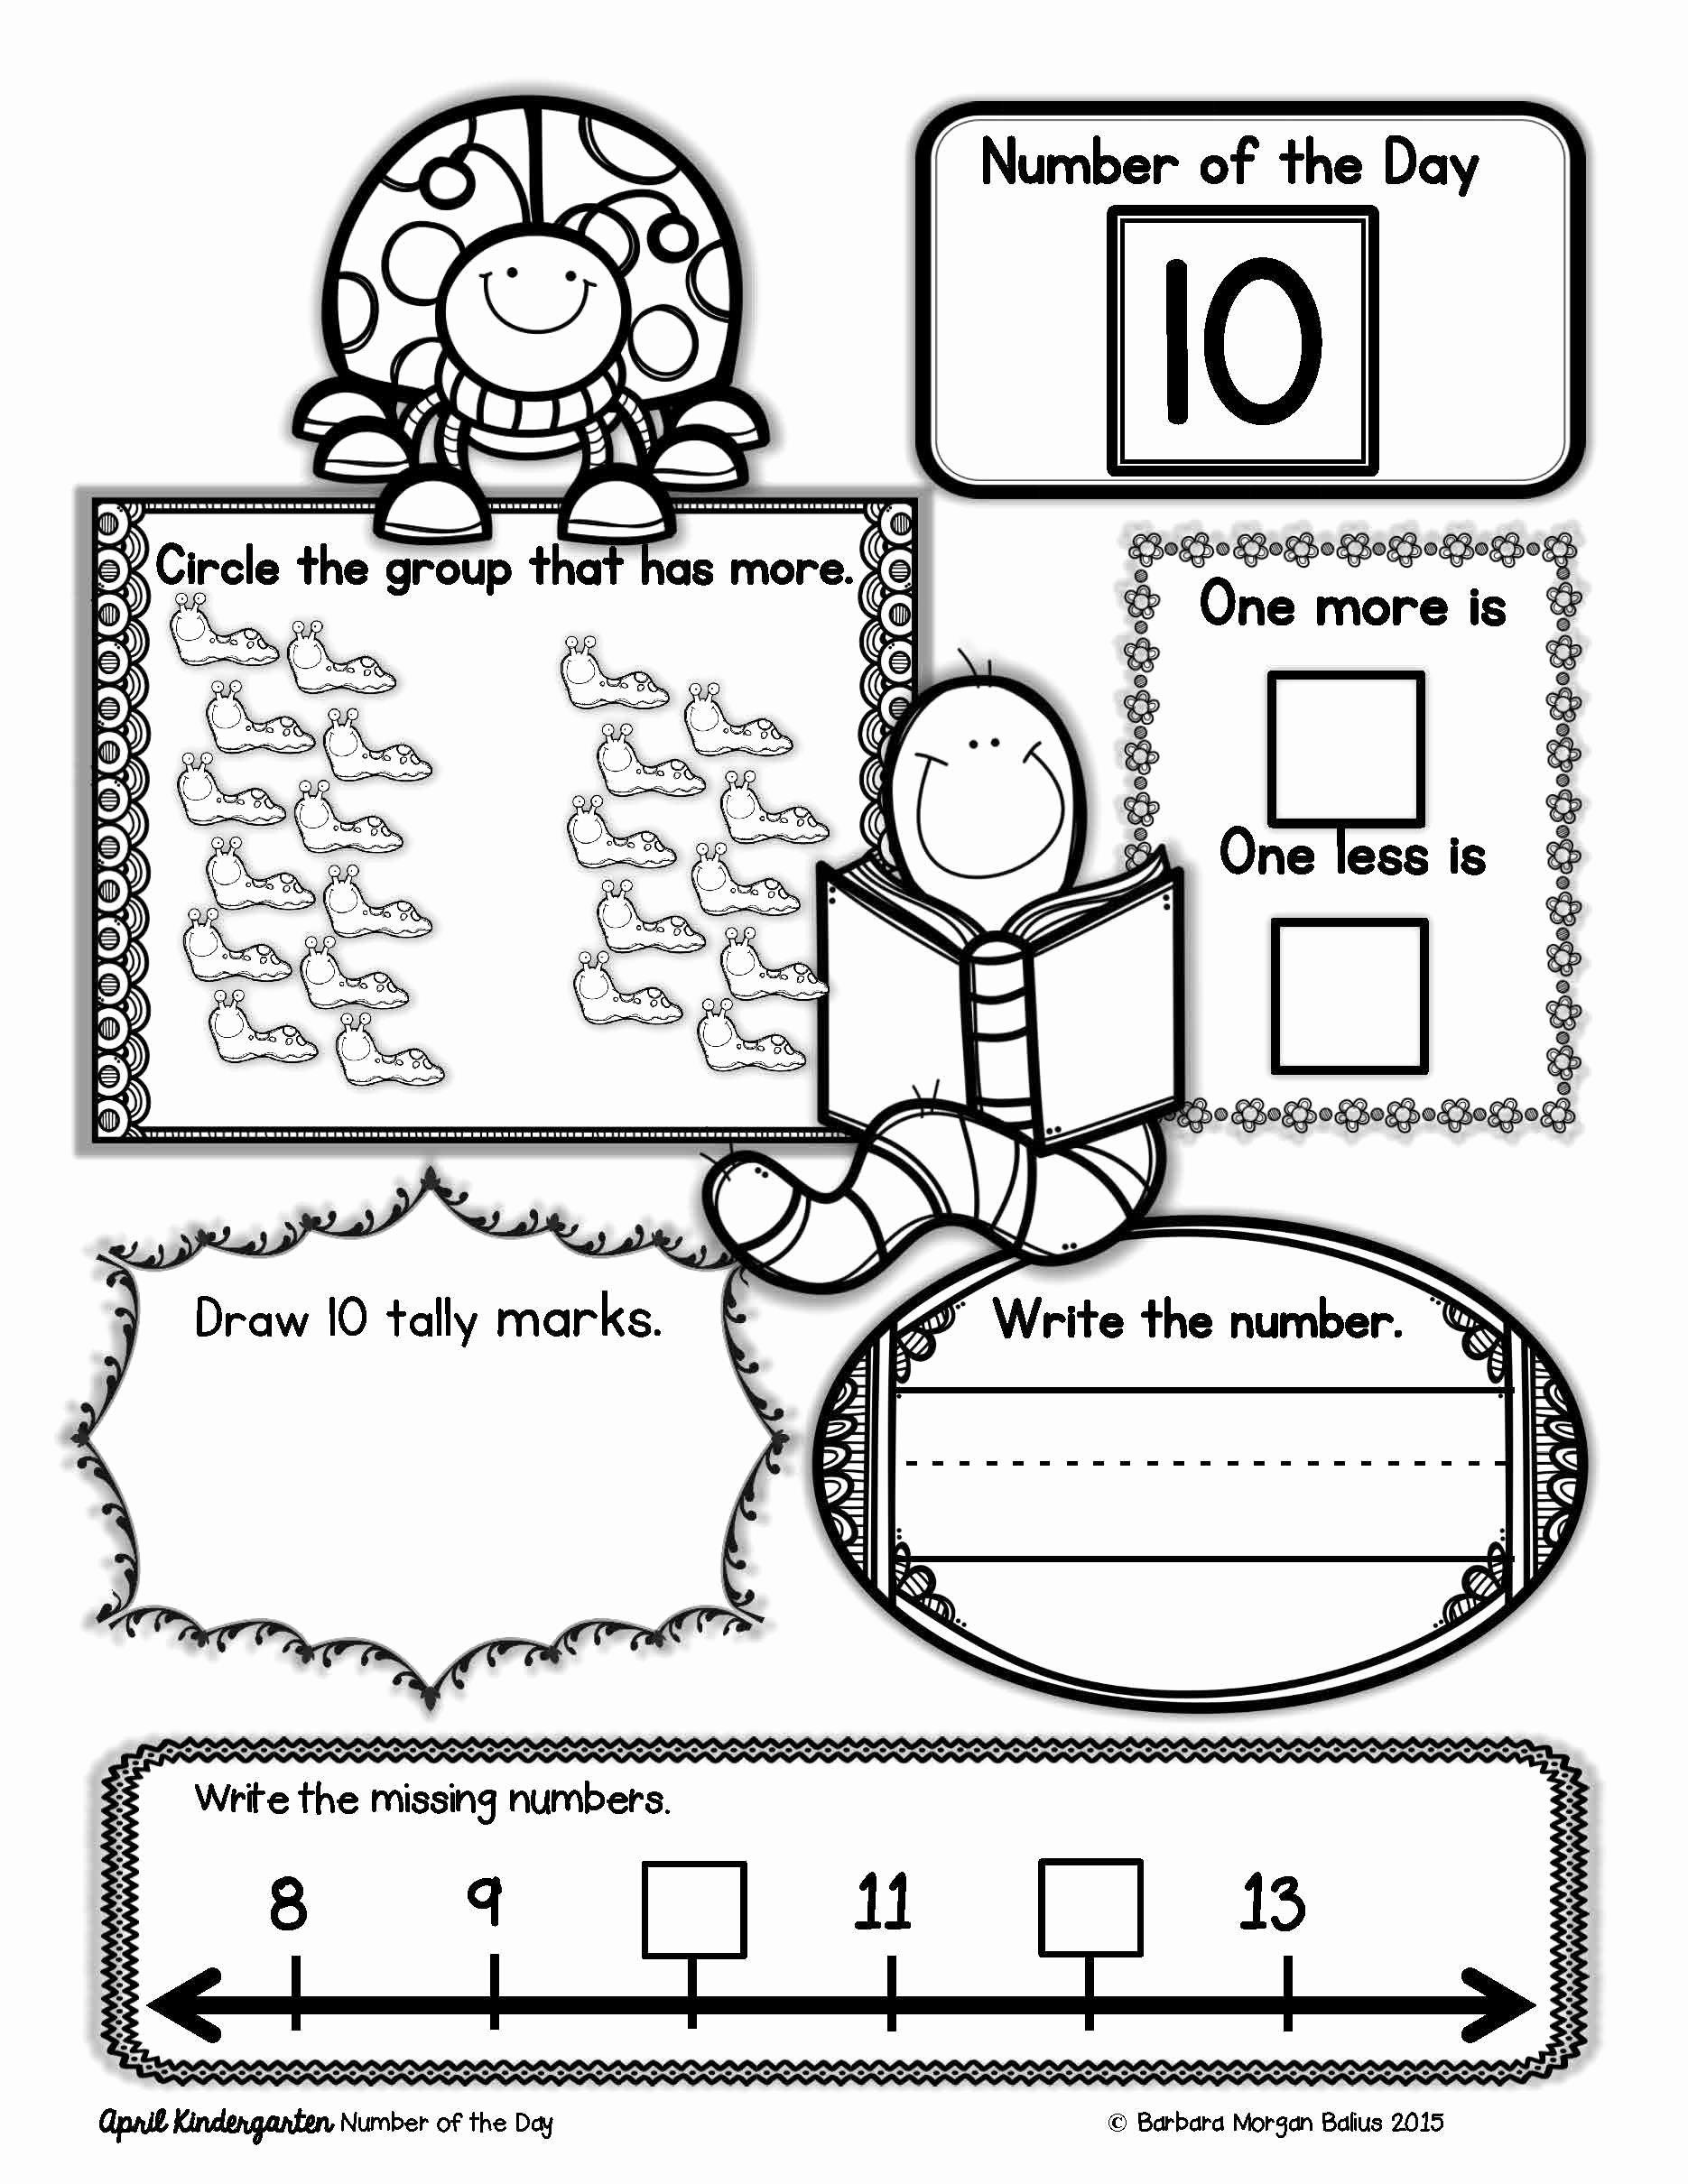 Learning to Write Worksheets for Preschoolers Lovely Worksheets Kindergarten Math Number the Sense Morning